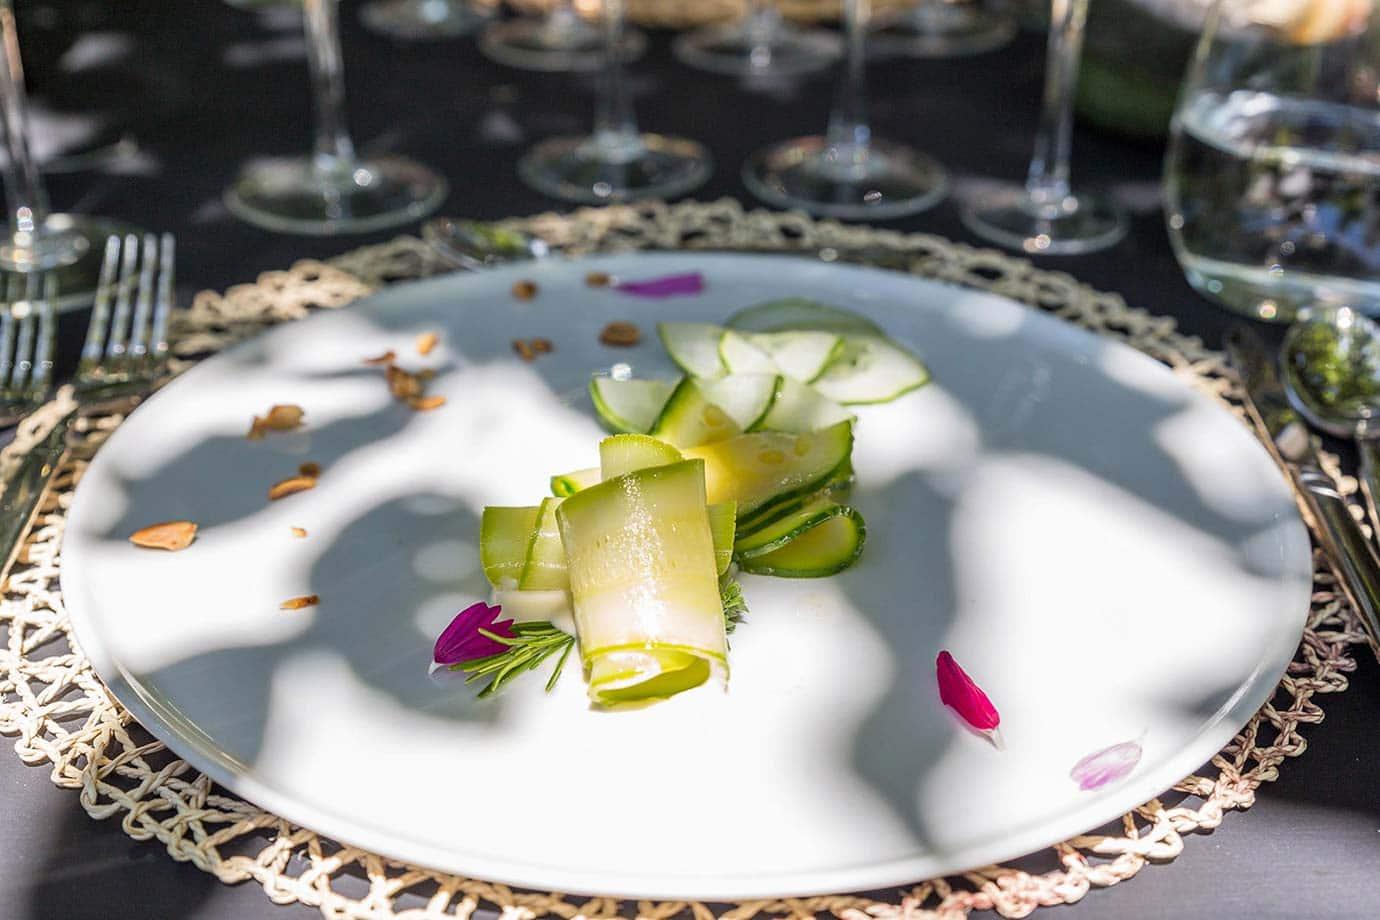 Squash carpaccio, infused ricotta, lemon vinaigrette and almond slice